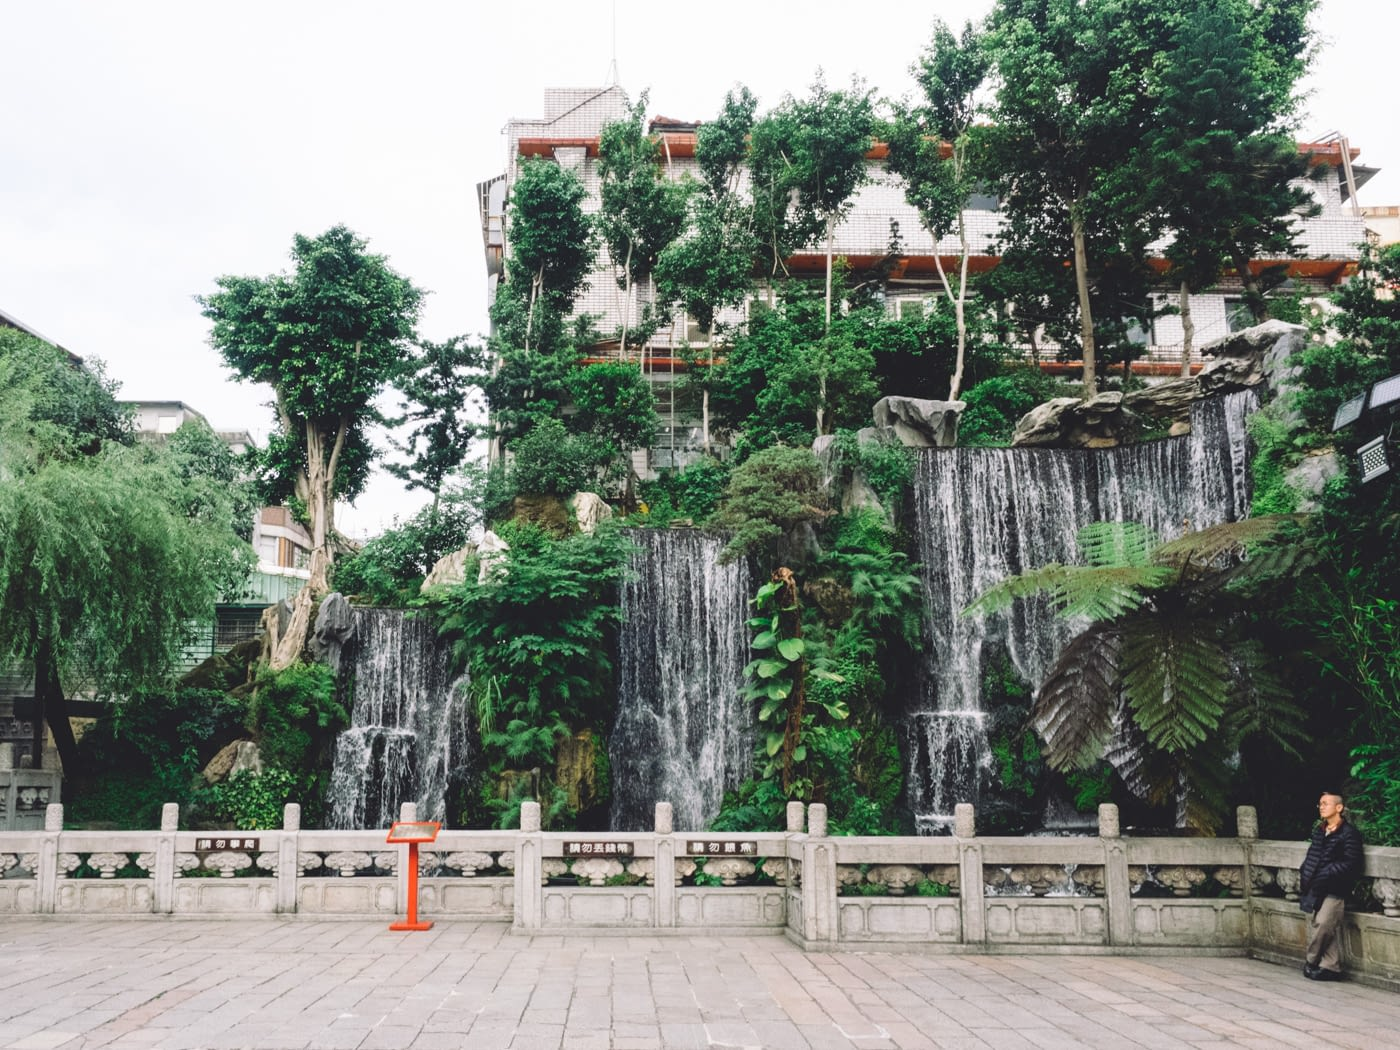 Taiwan - Taipei - Longshan Temple waterfall